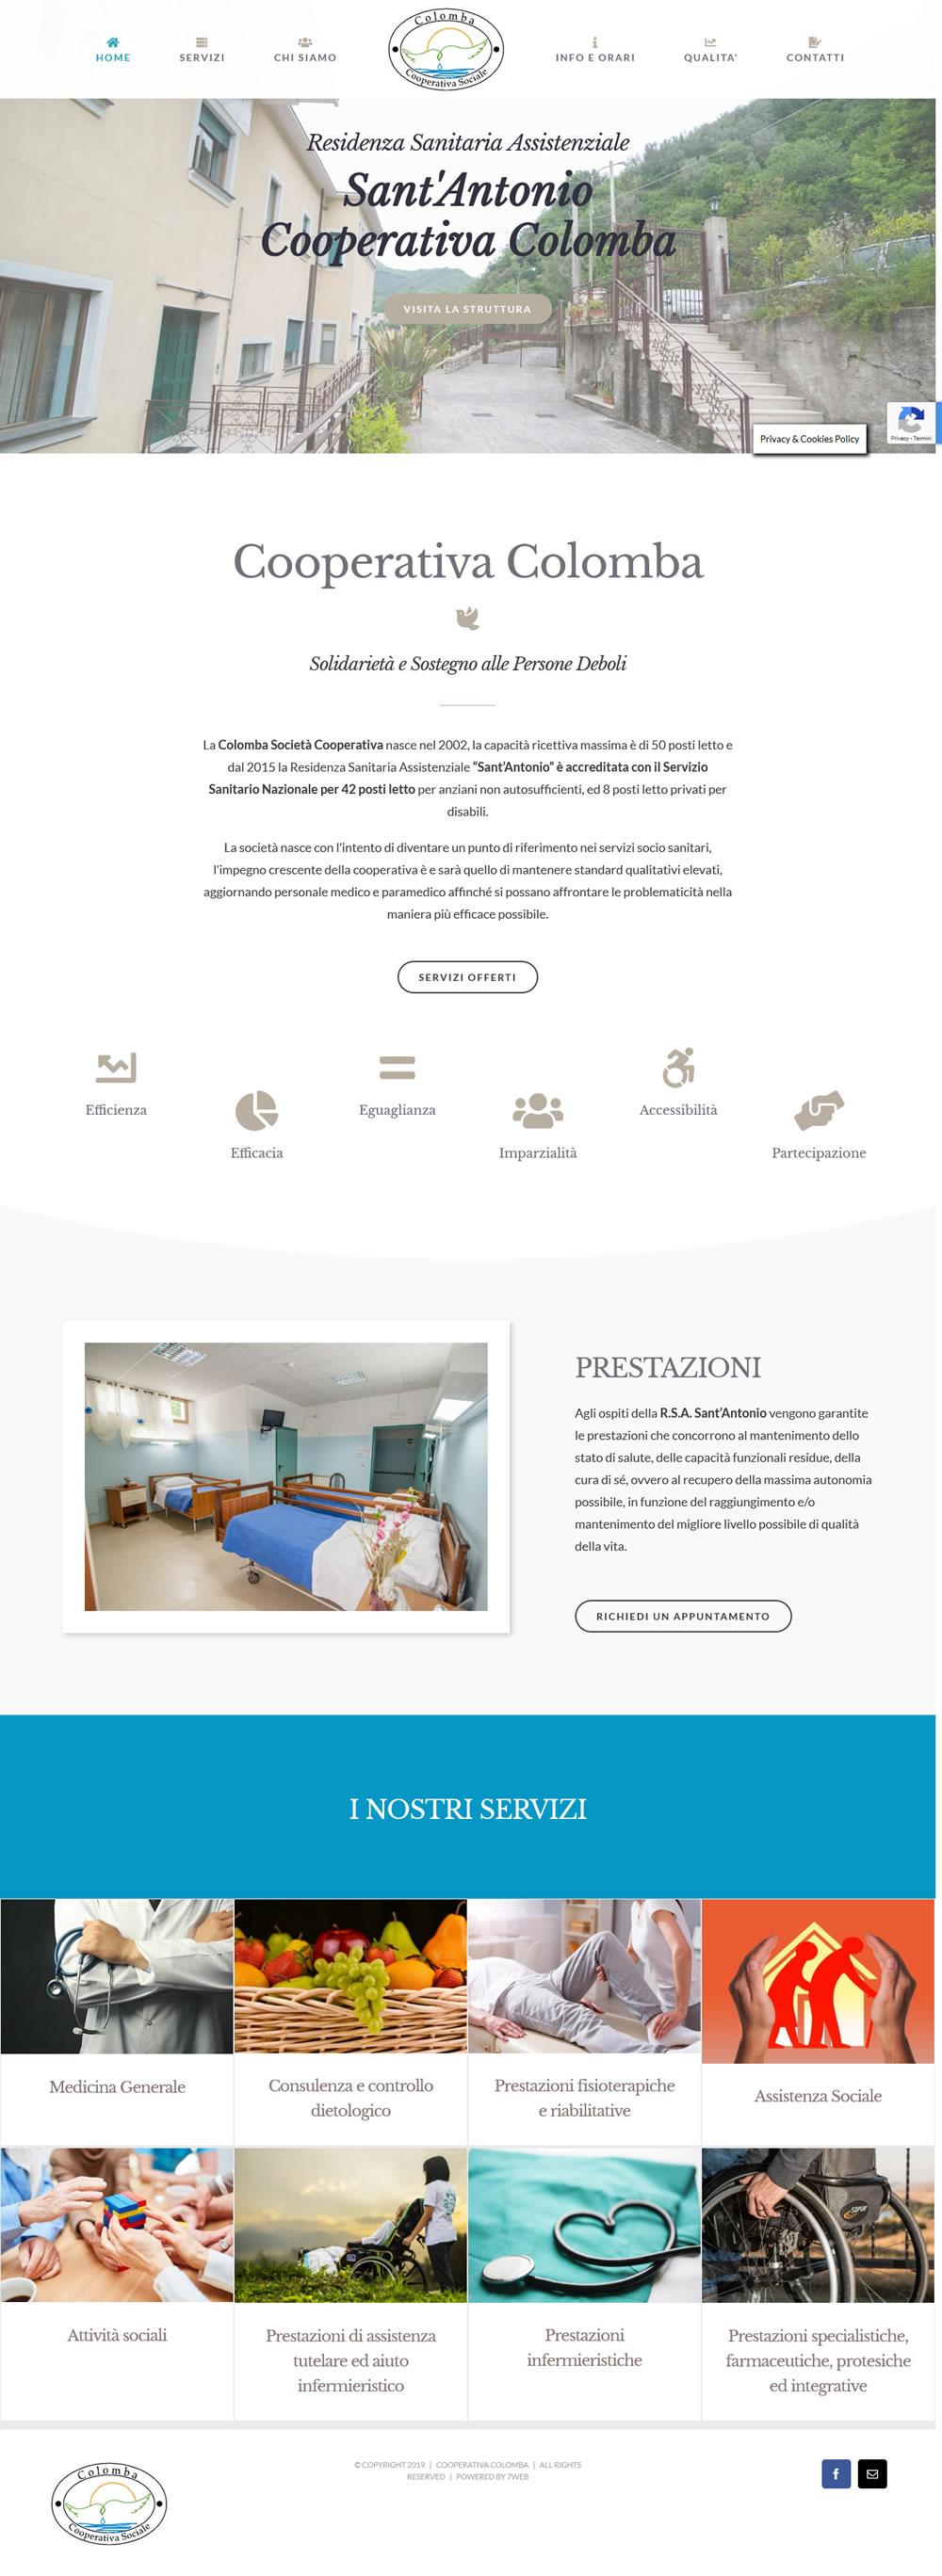 CoopColomba - Setteweb.it Portfolio Sito Web Wordpress 7Web-2019